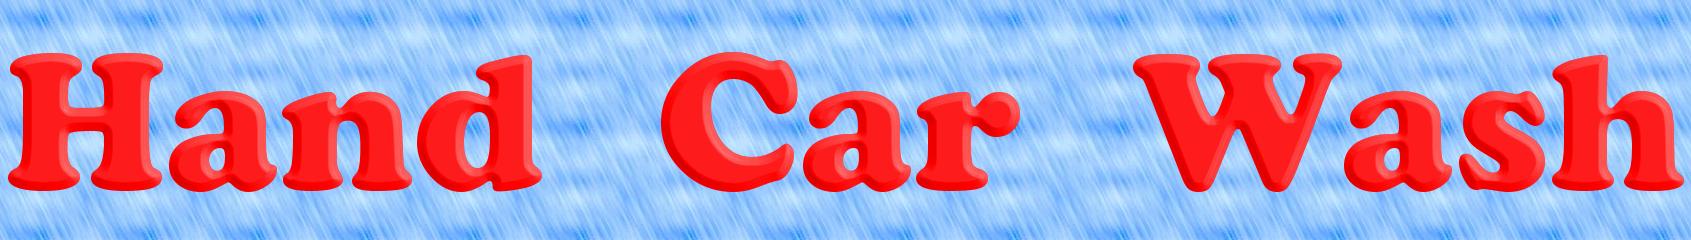 Hand Car Wash logo. Free logo maker.  Hand Car Wash l...